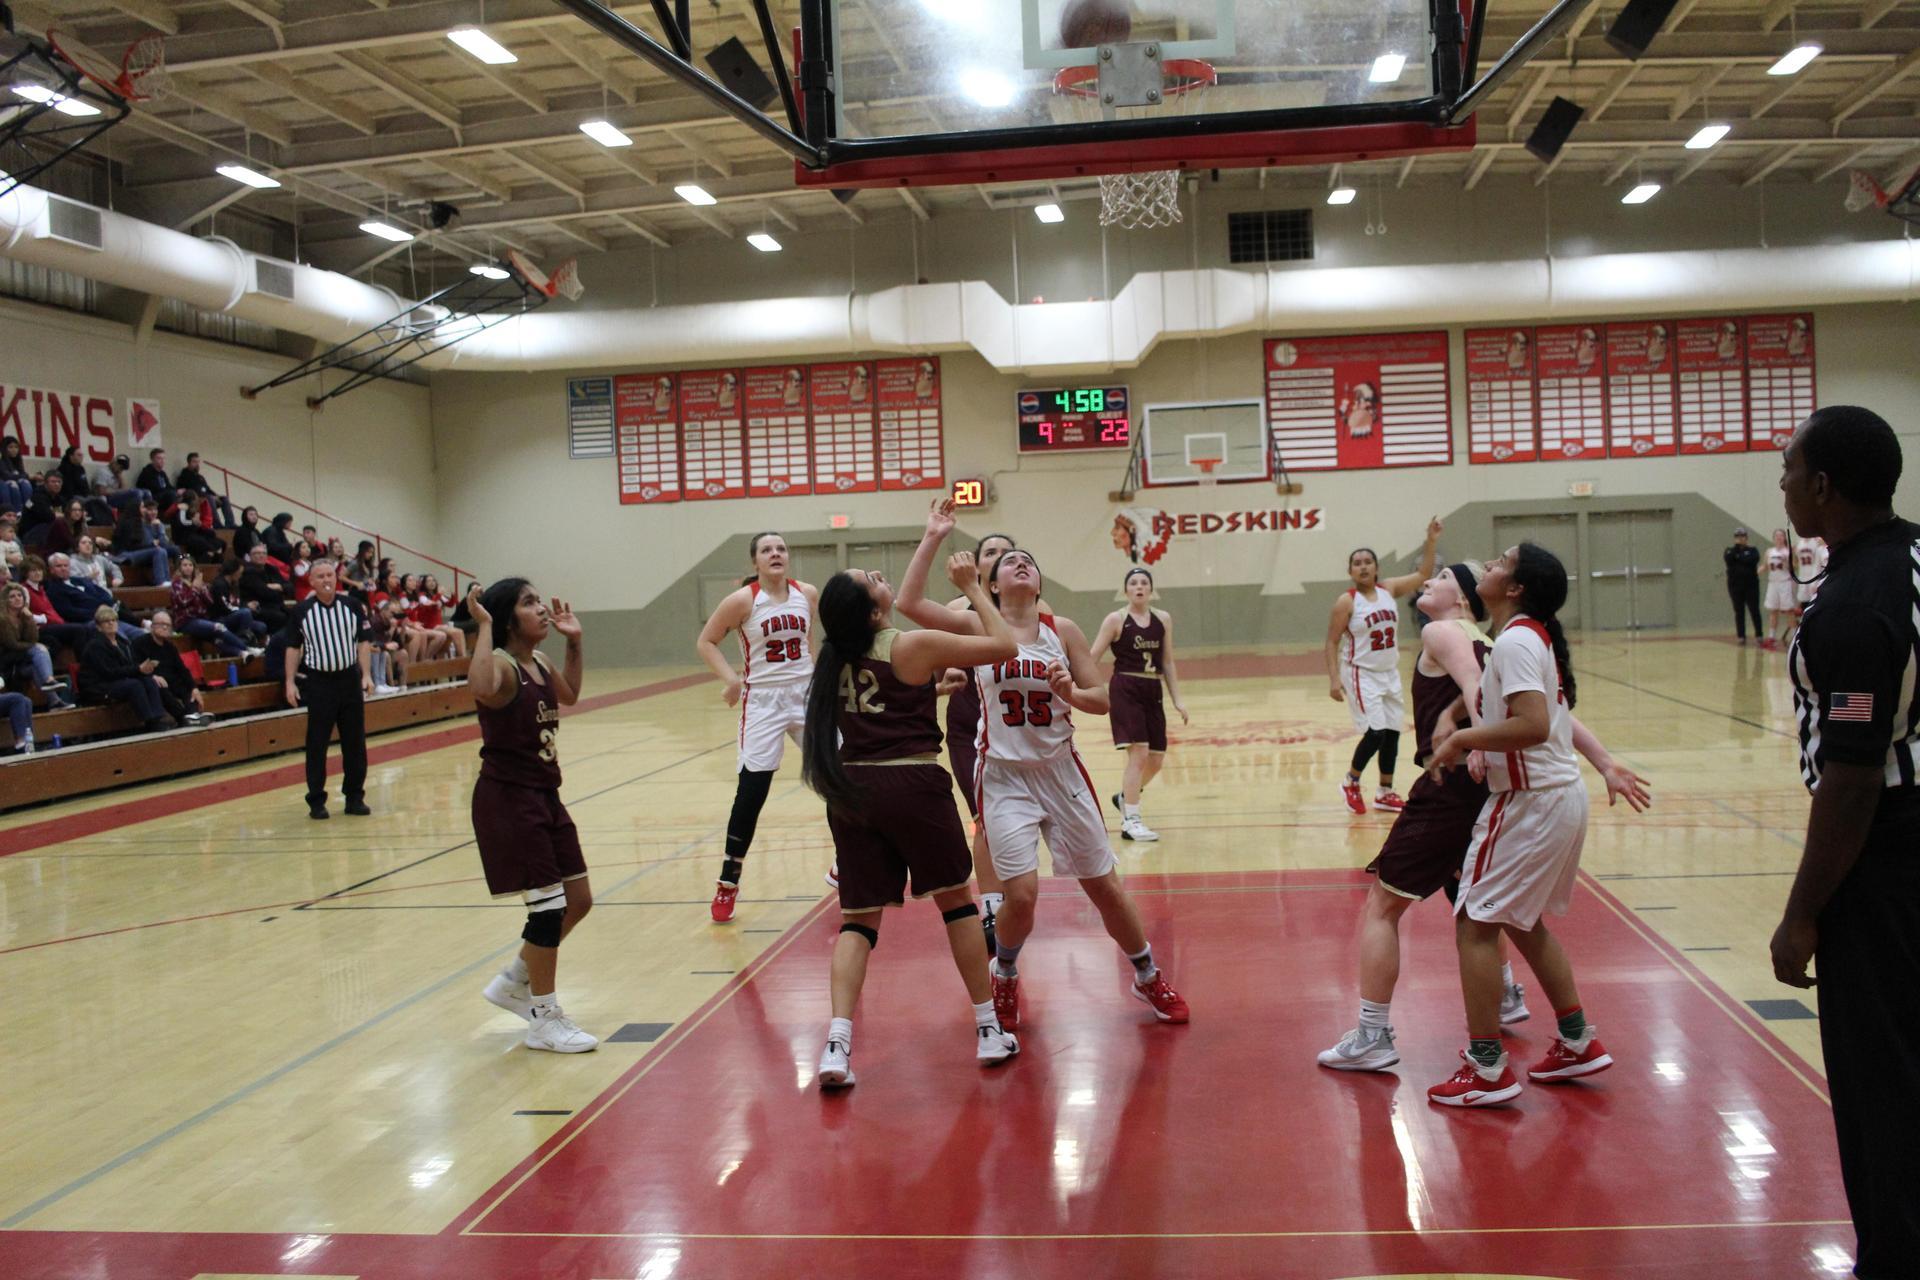 girls playing basketball